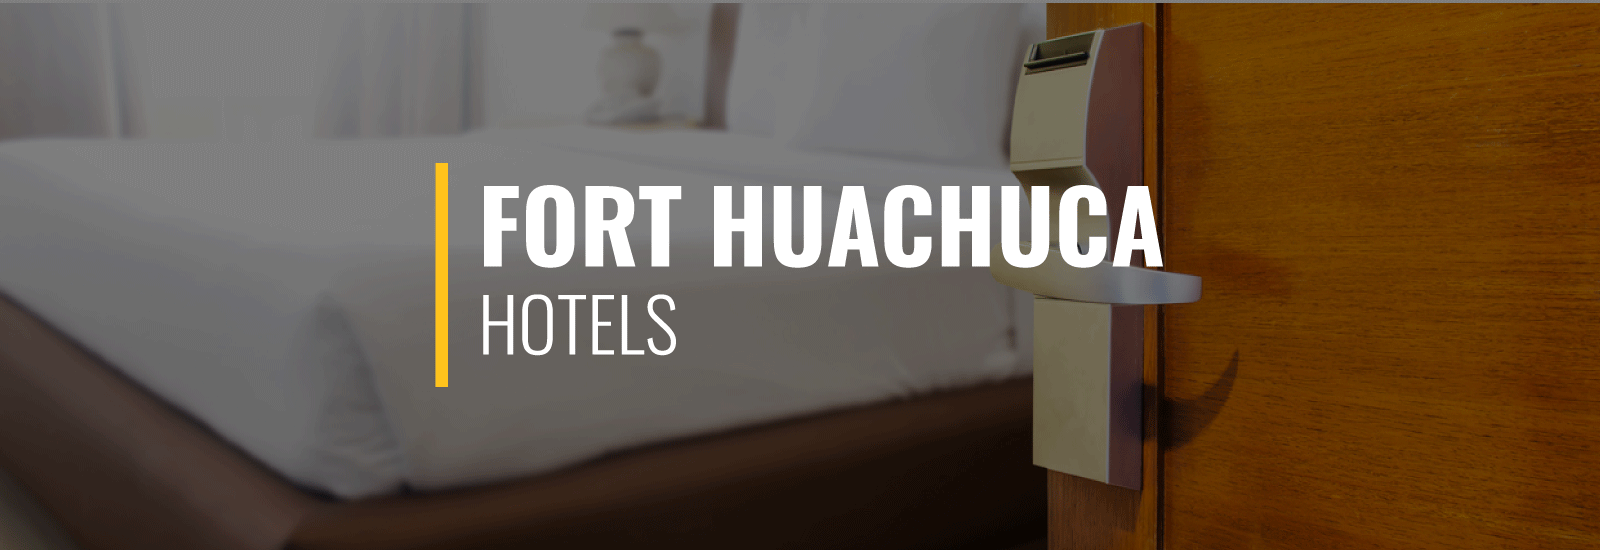 Fort Huachuca Hotels